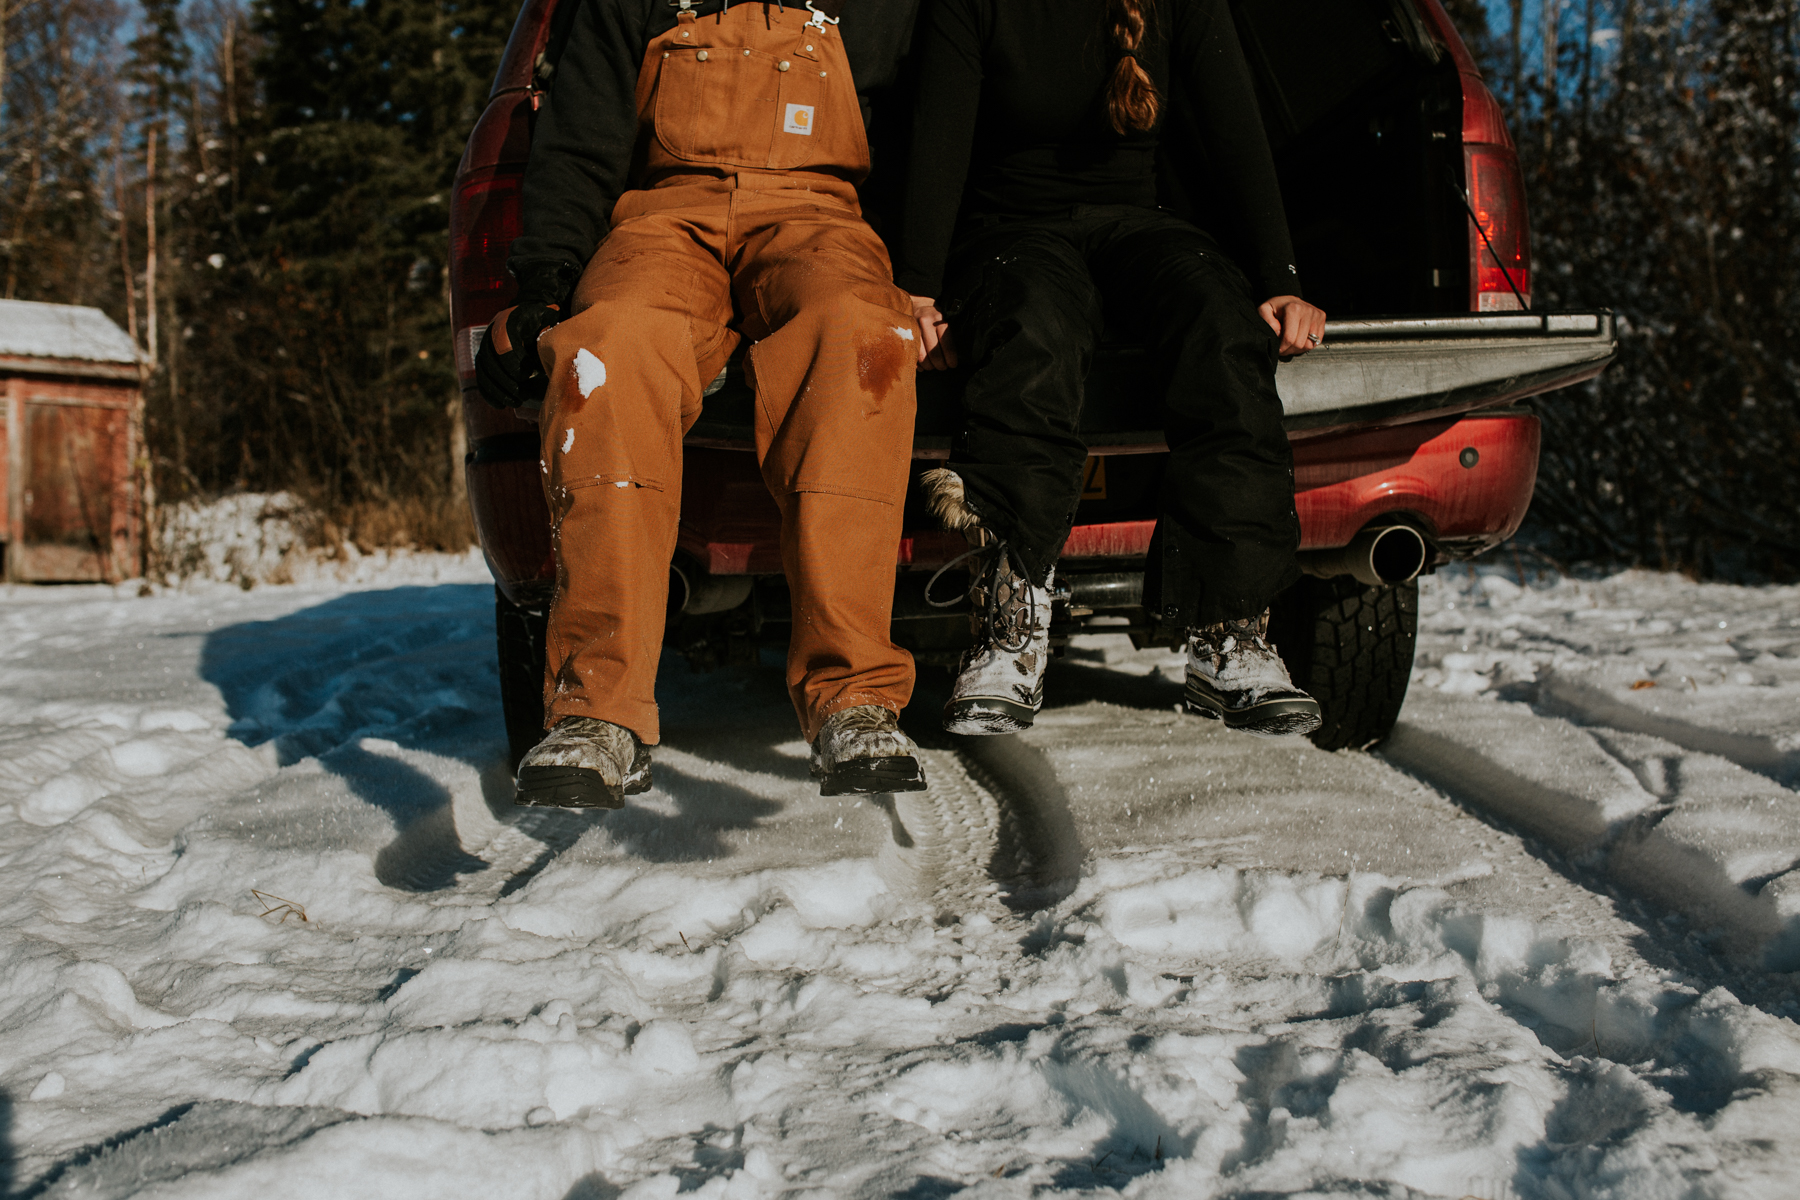 Carhartt in Snow